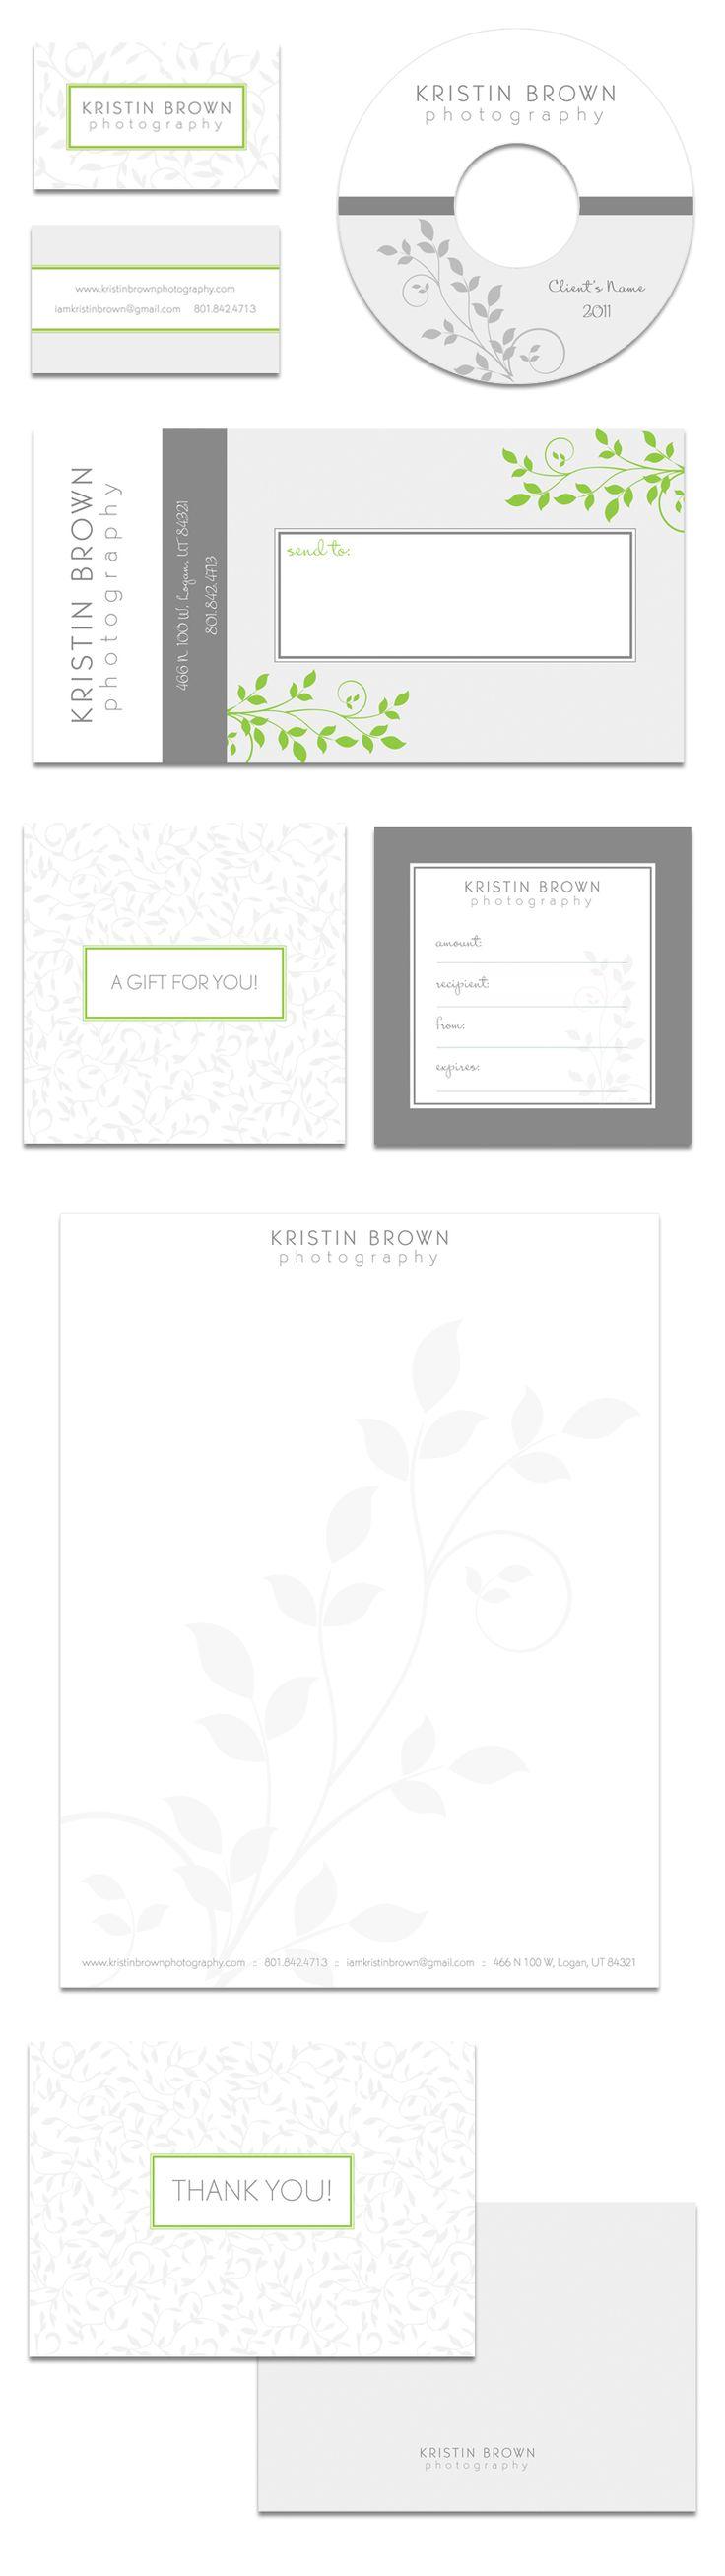 custom designed photographer branding kit by Tiffany Kelley Design (www.tiffanykelley.com)